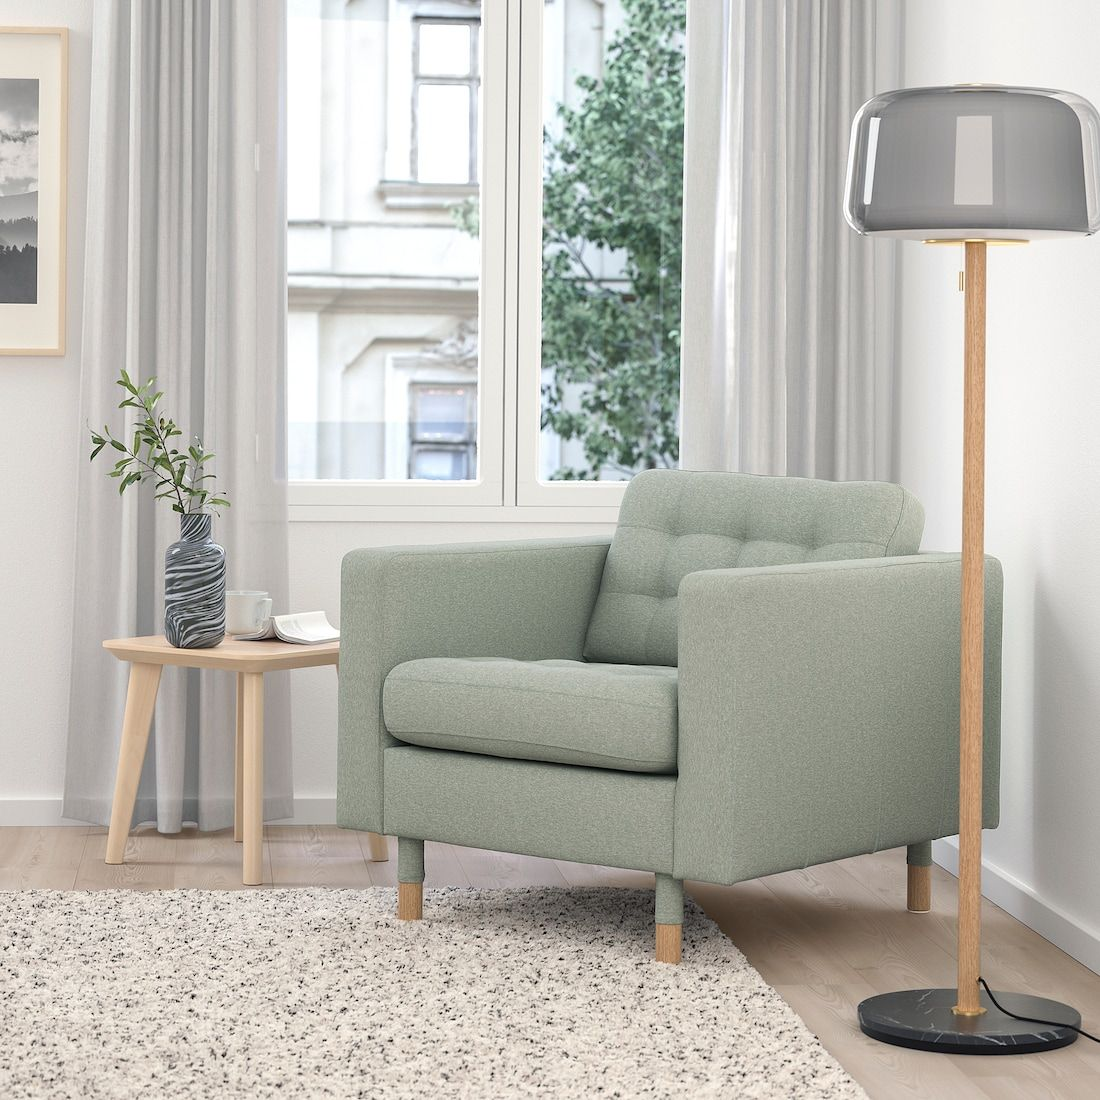 MORABO Armchair, Gunnared light green, Width 35 7/8